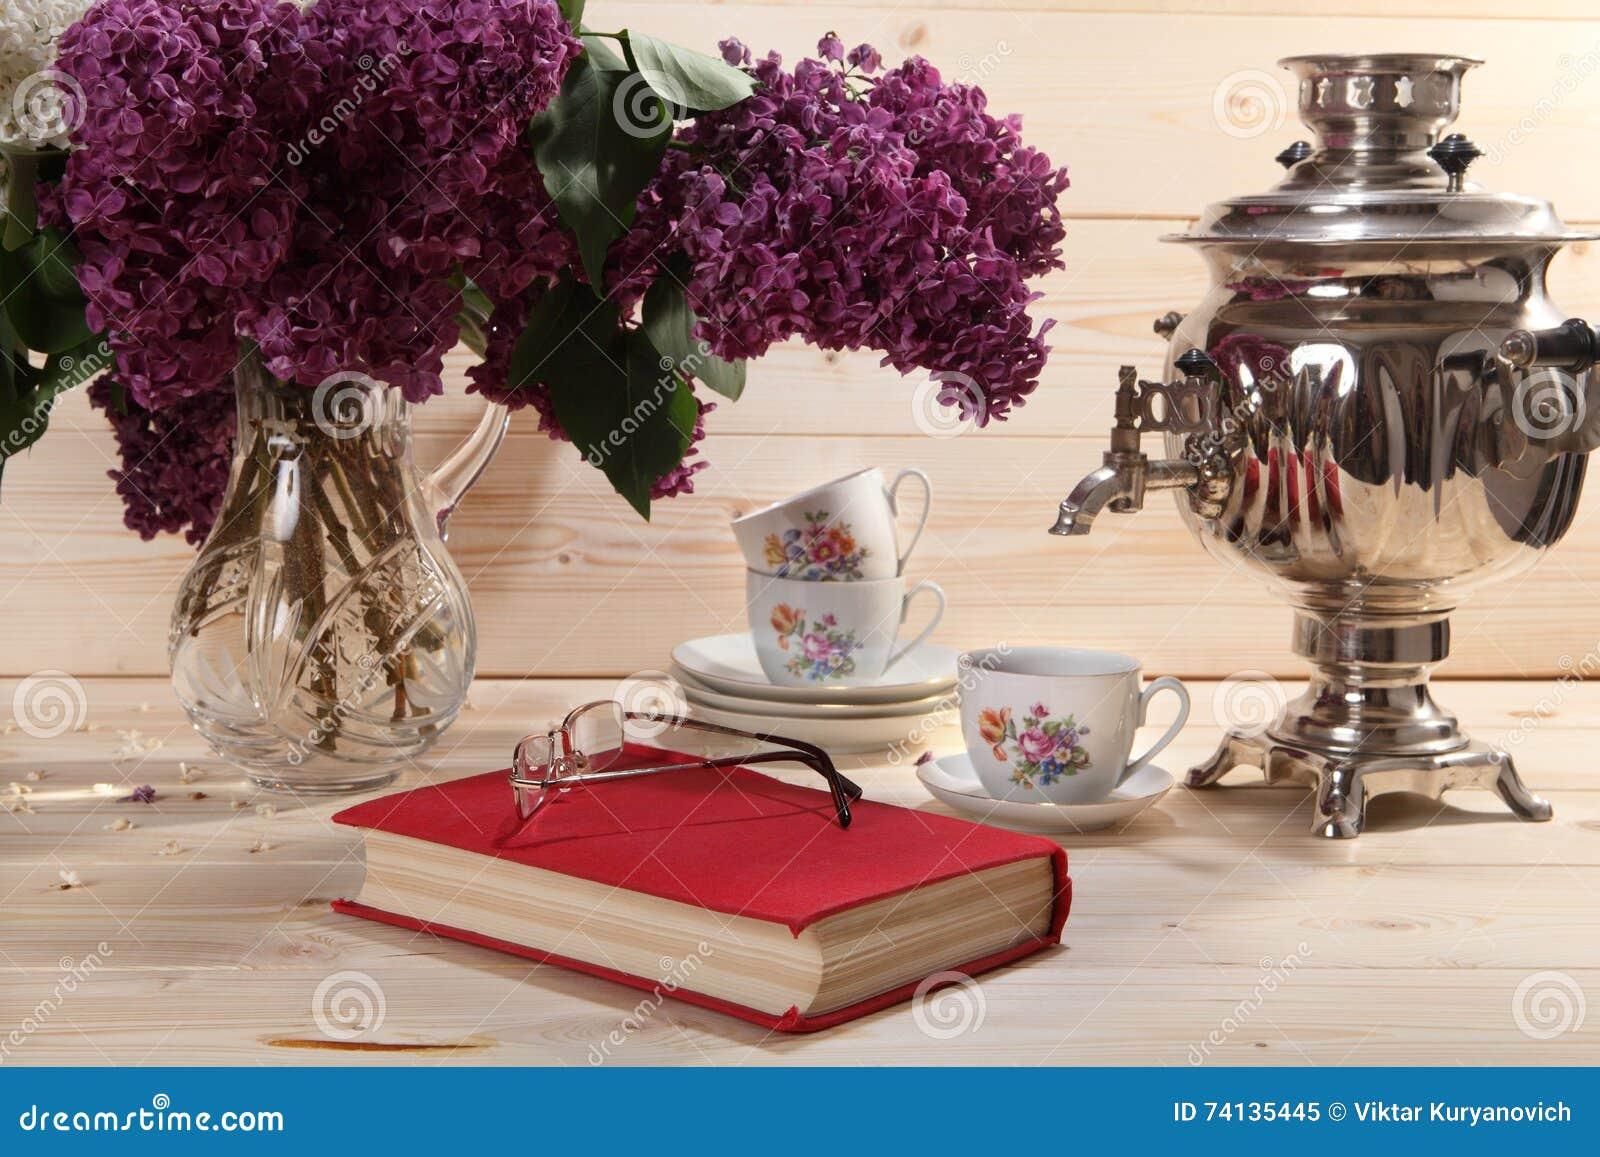 Boeket van seringen, samovar, kop thee, boek en bril